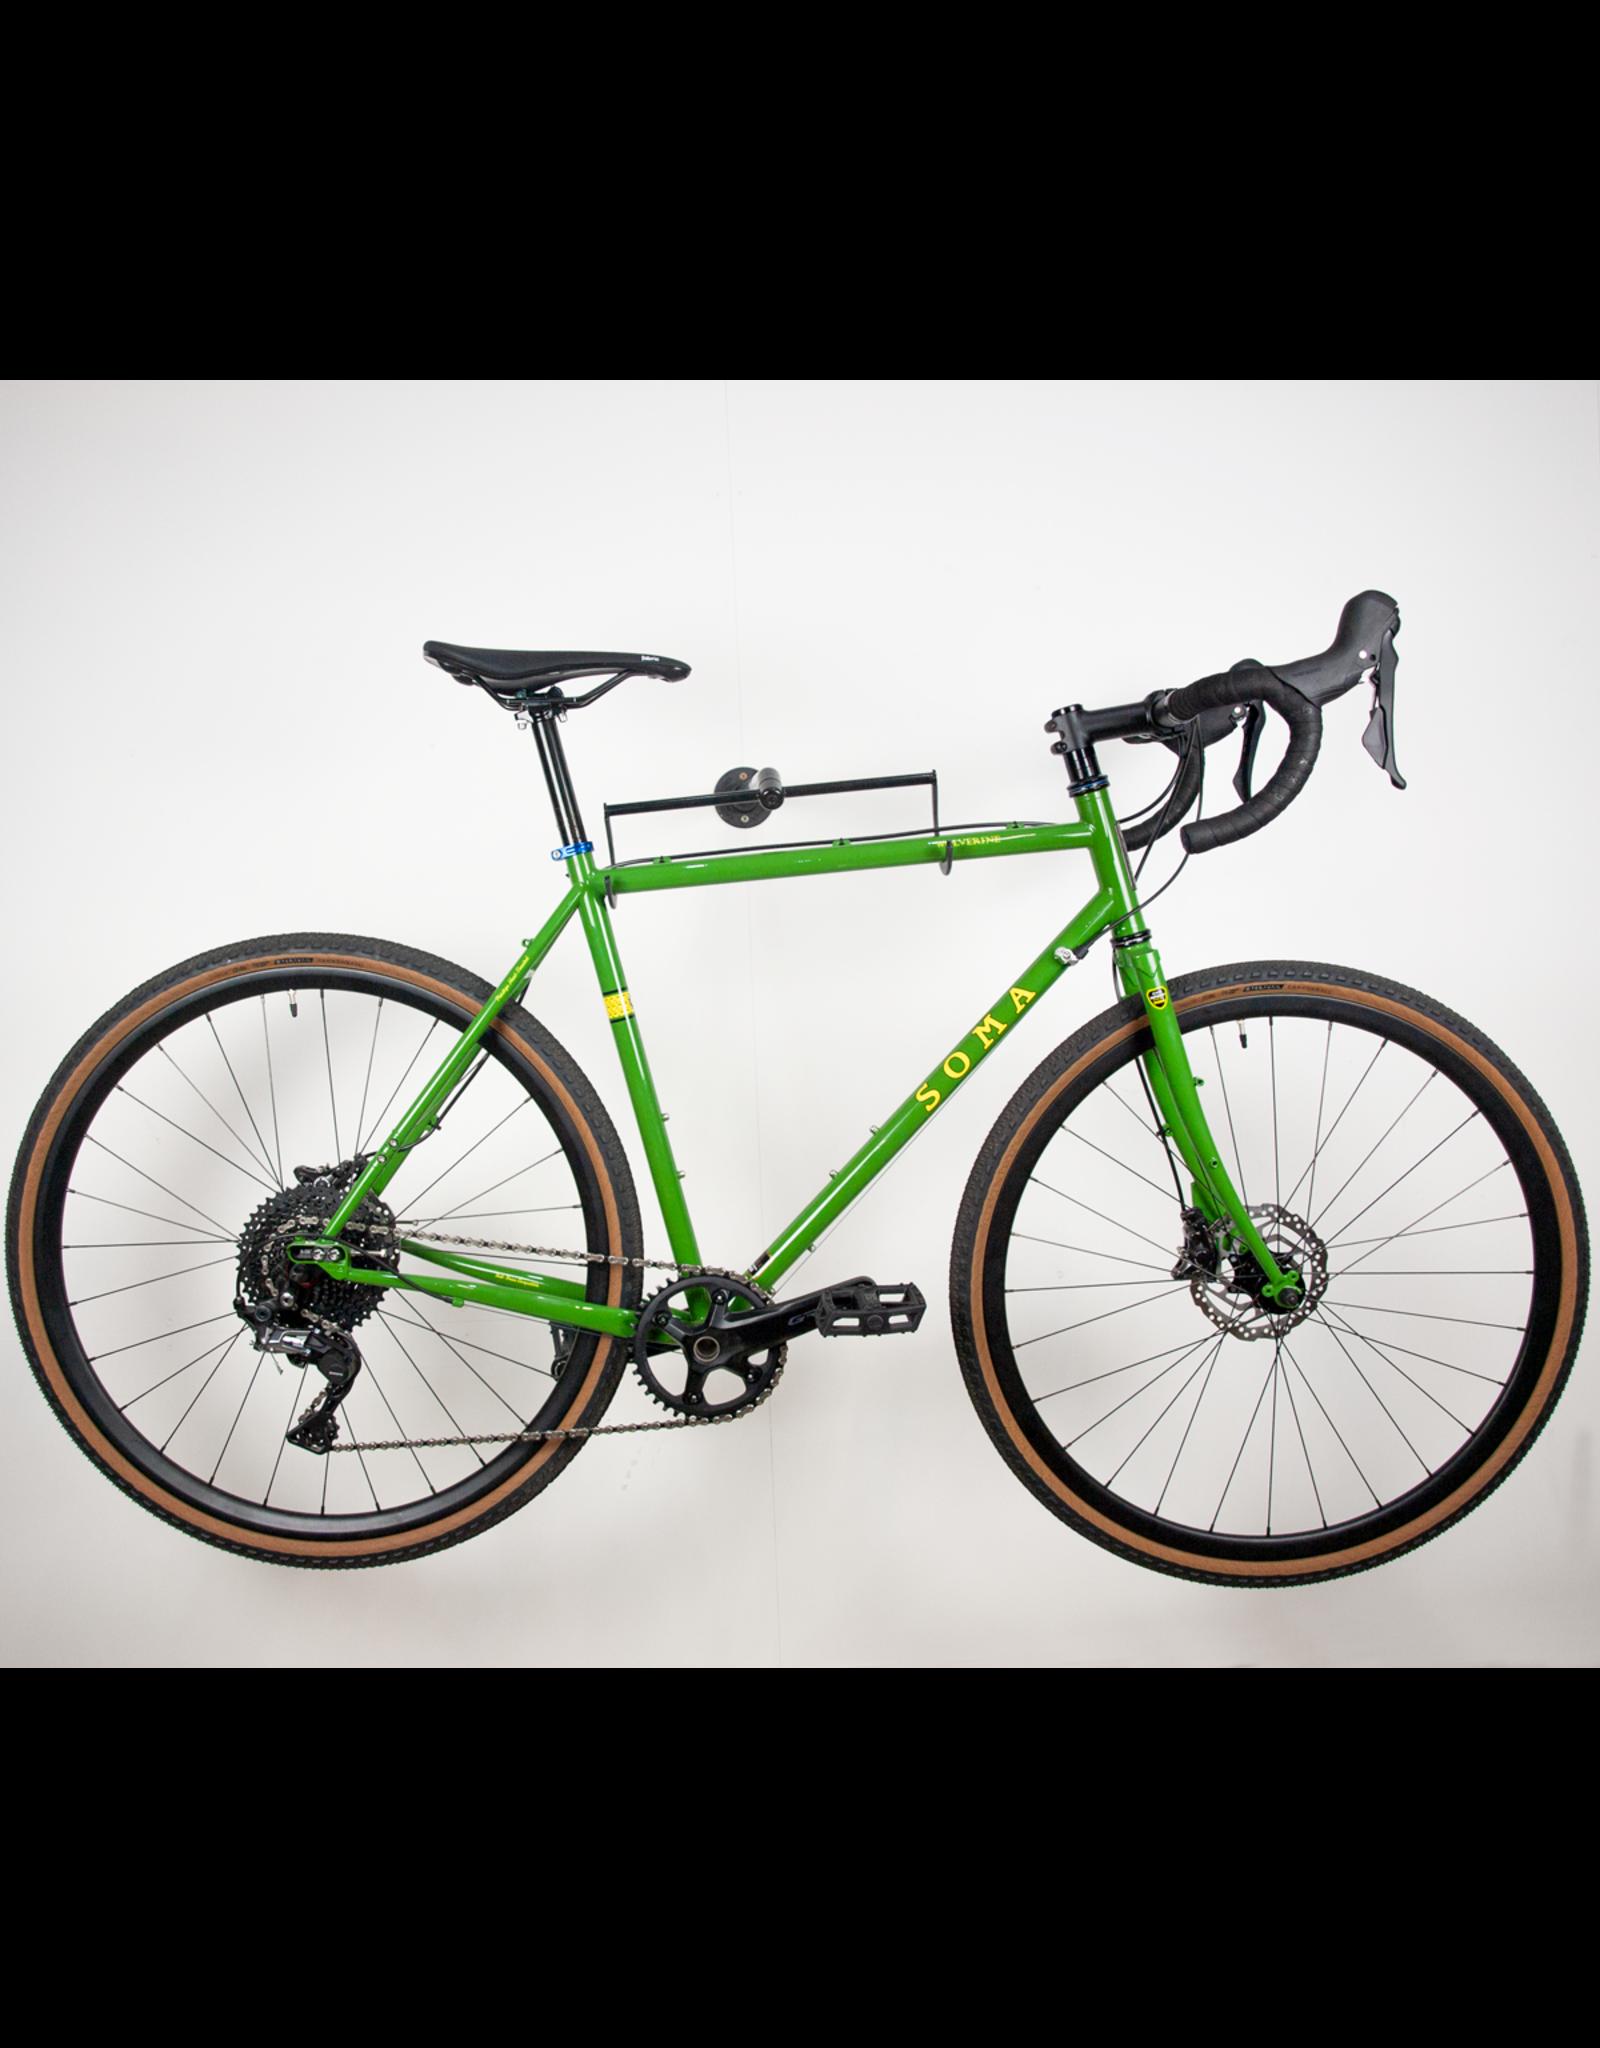 Seabass cycles X Soma Wolverine shopfloor build GRX - 54cm